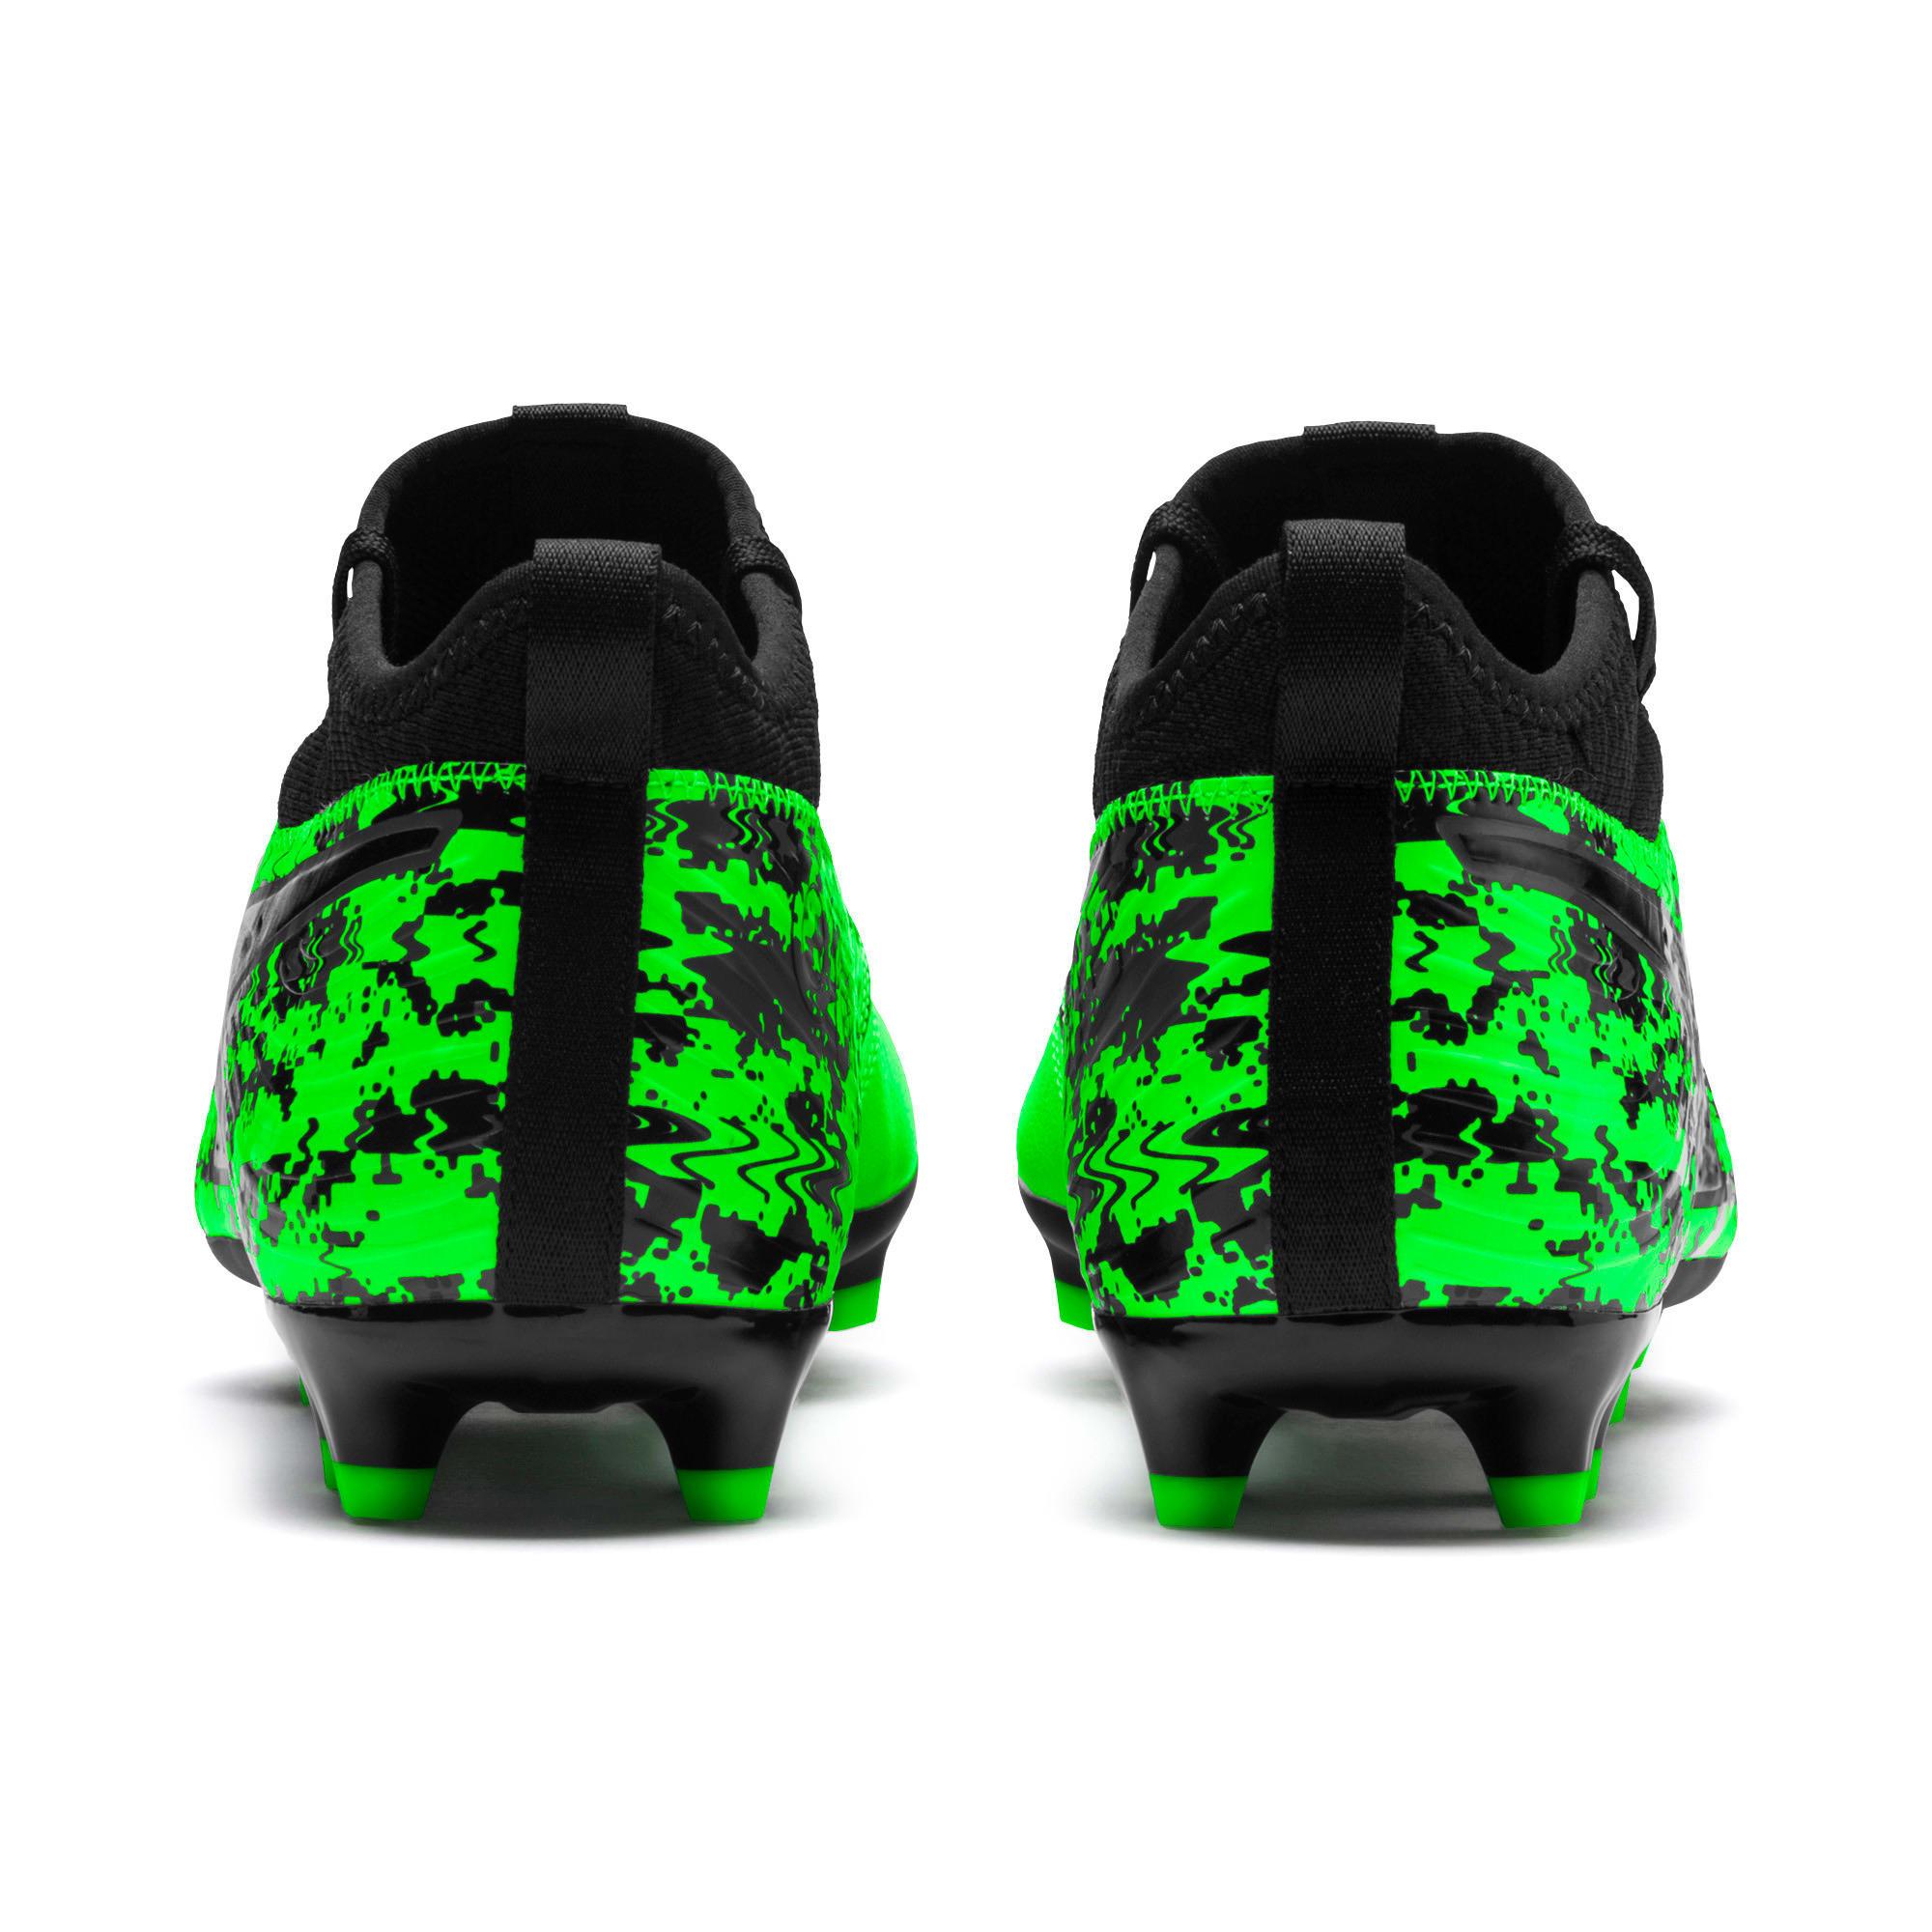 Thumbnail 3 of PUMA ONE 19.3 FG/AG Men's Soccer Cleats, Green Gecko-Black-Gray, medium